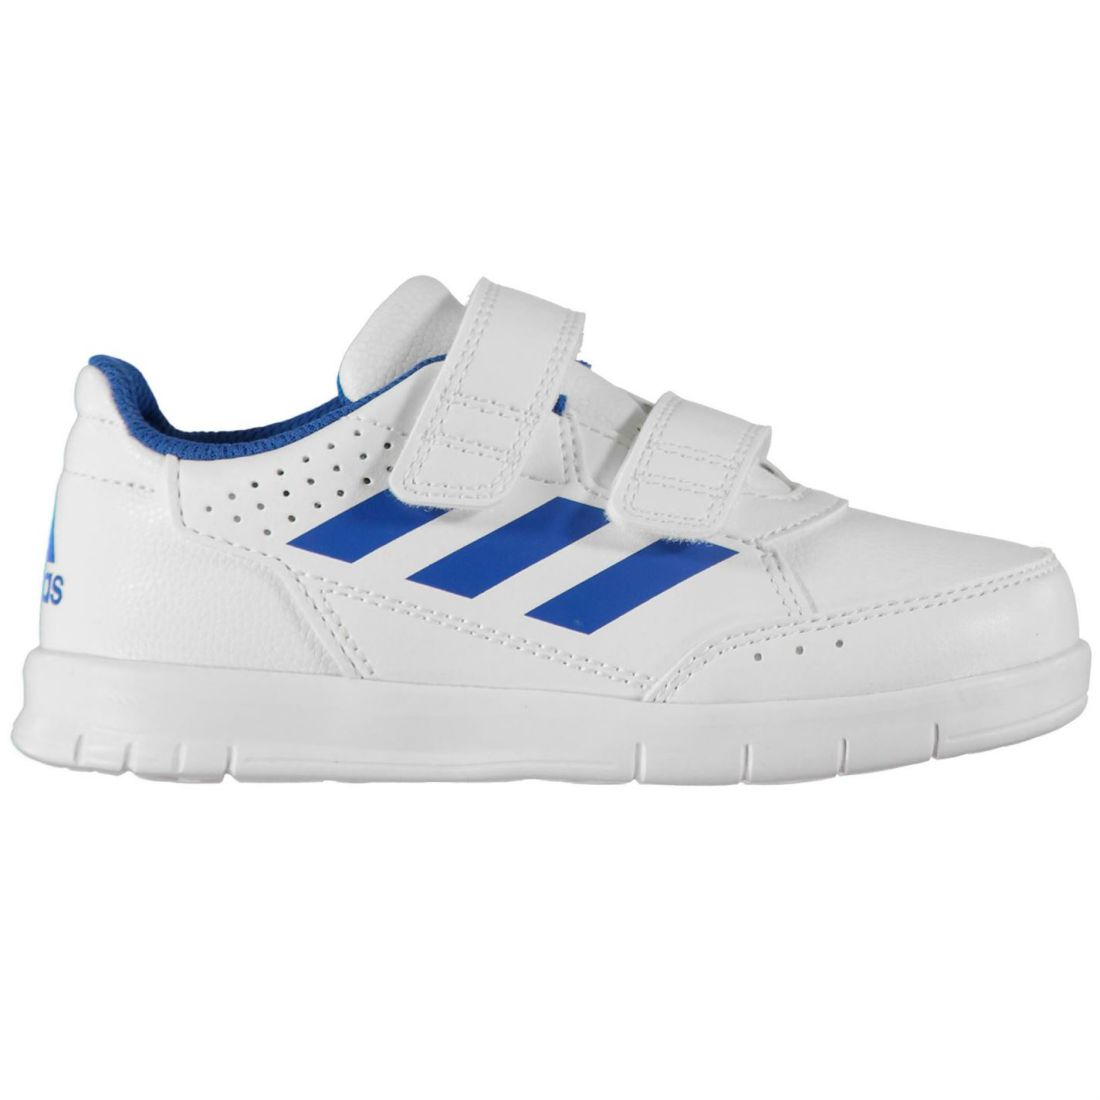 hot sales 3146c 6ae84 adidas Kids AltaSport CF Trainers Infant Boys Shoes Hook and Loop Ortholite